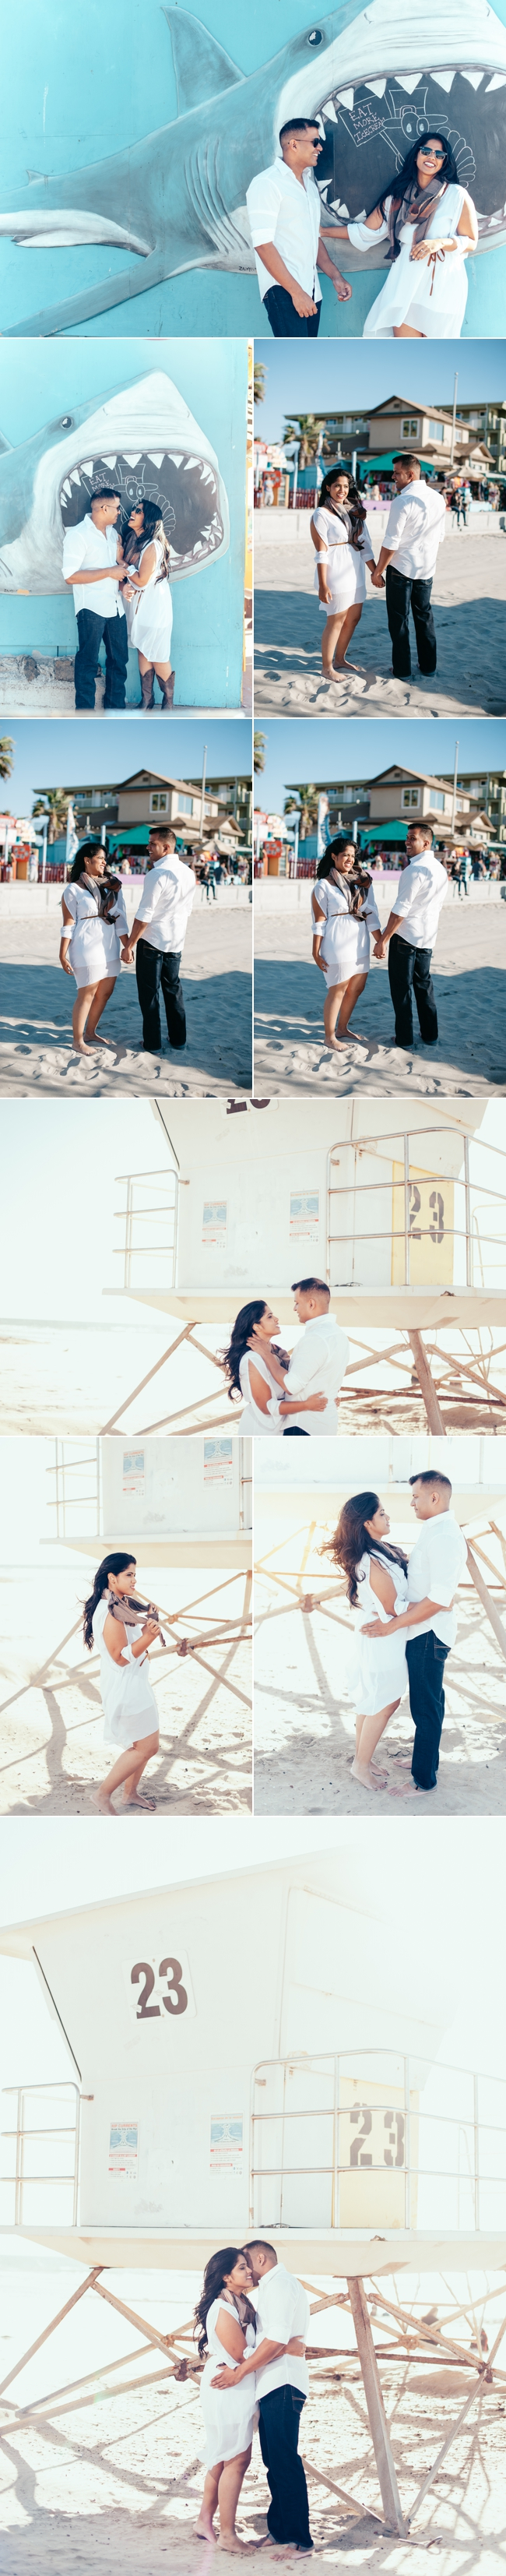 destination-wedding-photographers-california 4.jpg